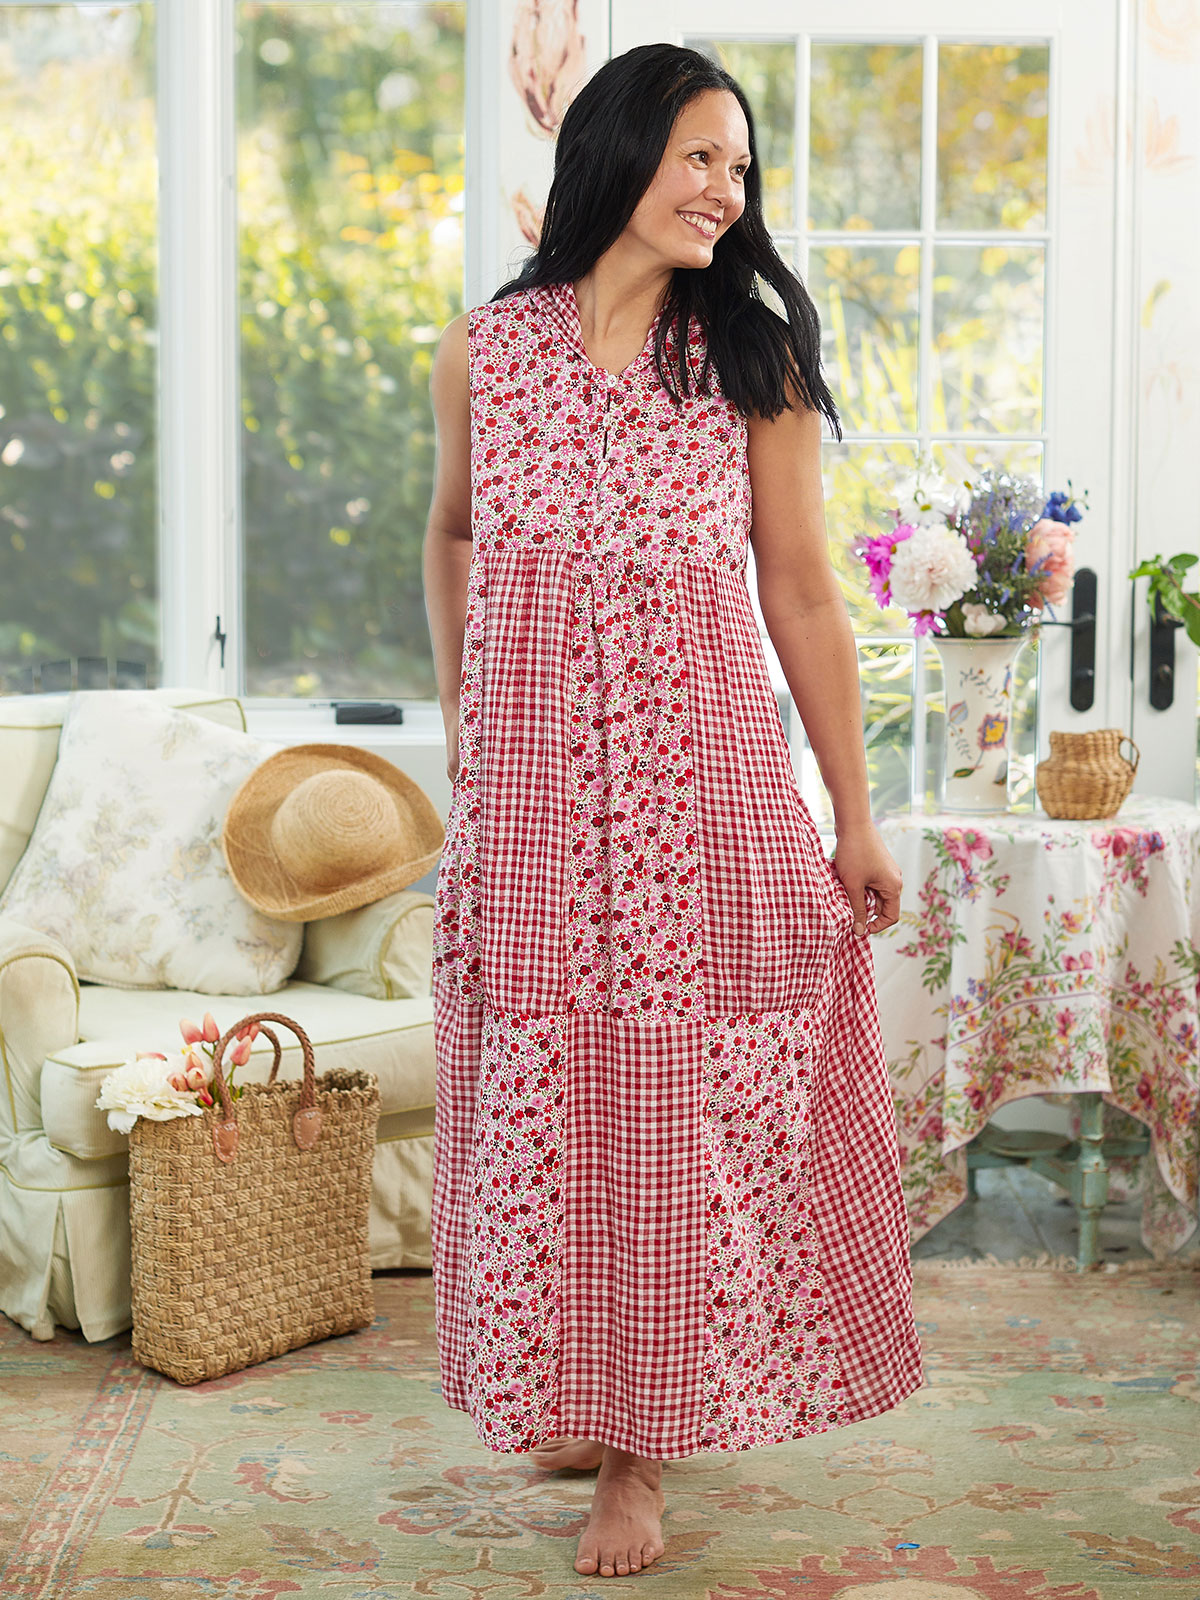 Sweetheart Patchwork Dress